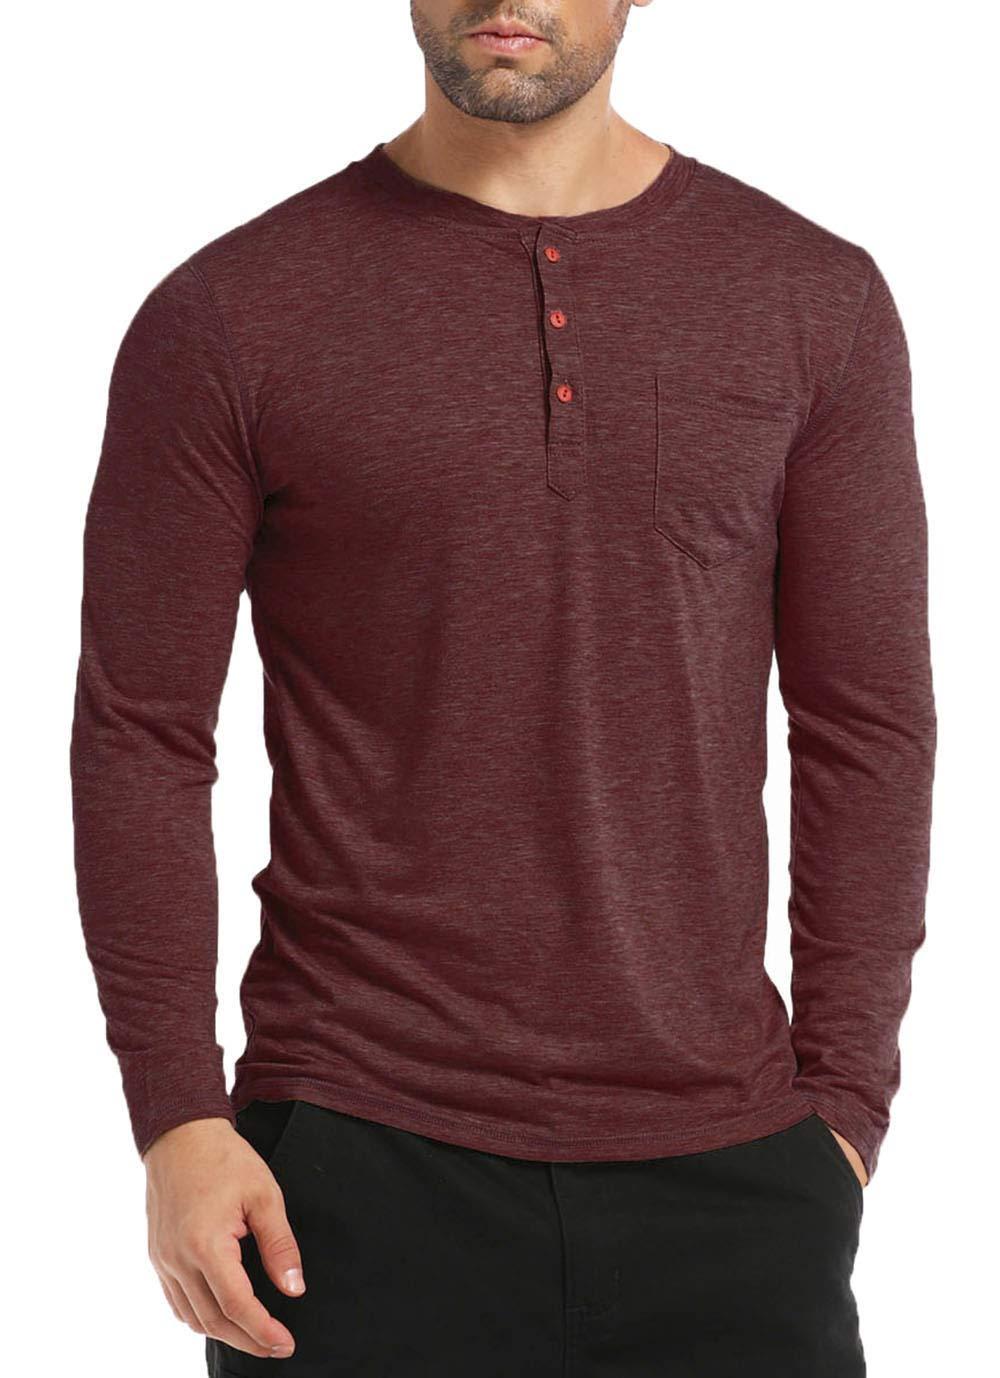 BABEIYXM Men's Henley Long Sleeve Shirts Soild Tee Shirts Front Pocket Tops Basic T-Shirts,WineRed,L